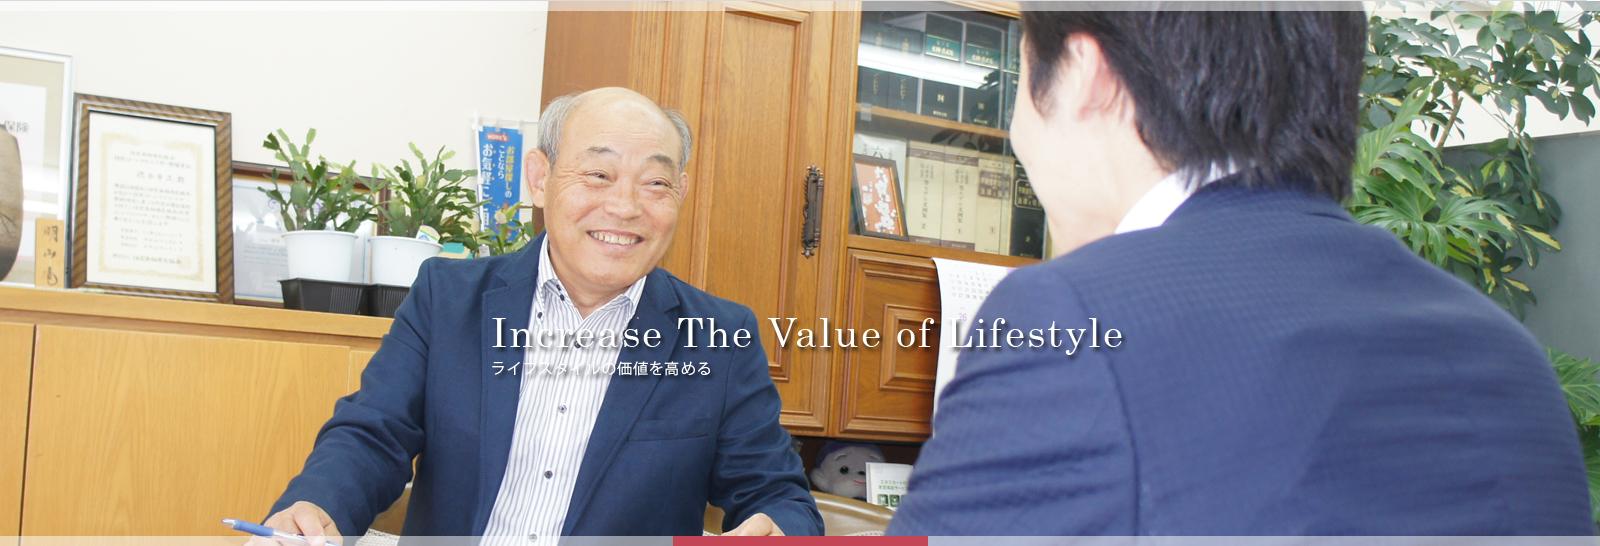 Increase The Value of Lifestyle ライフスタイルの価値を高める